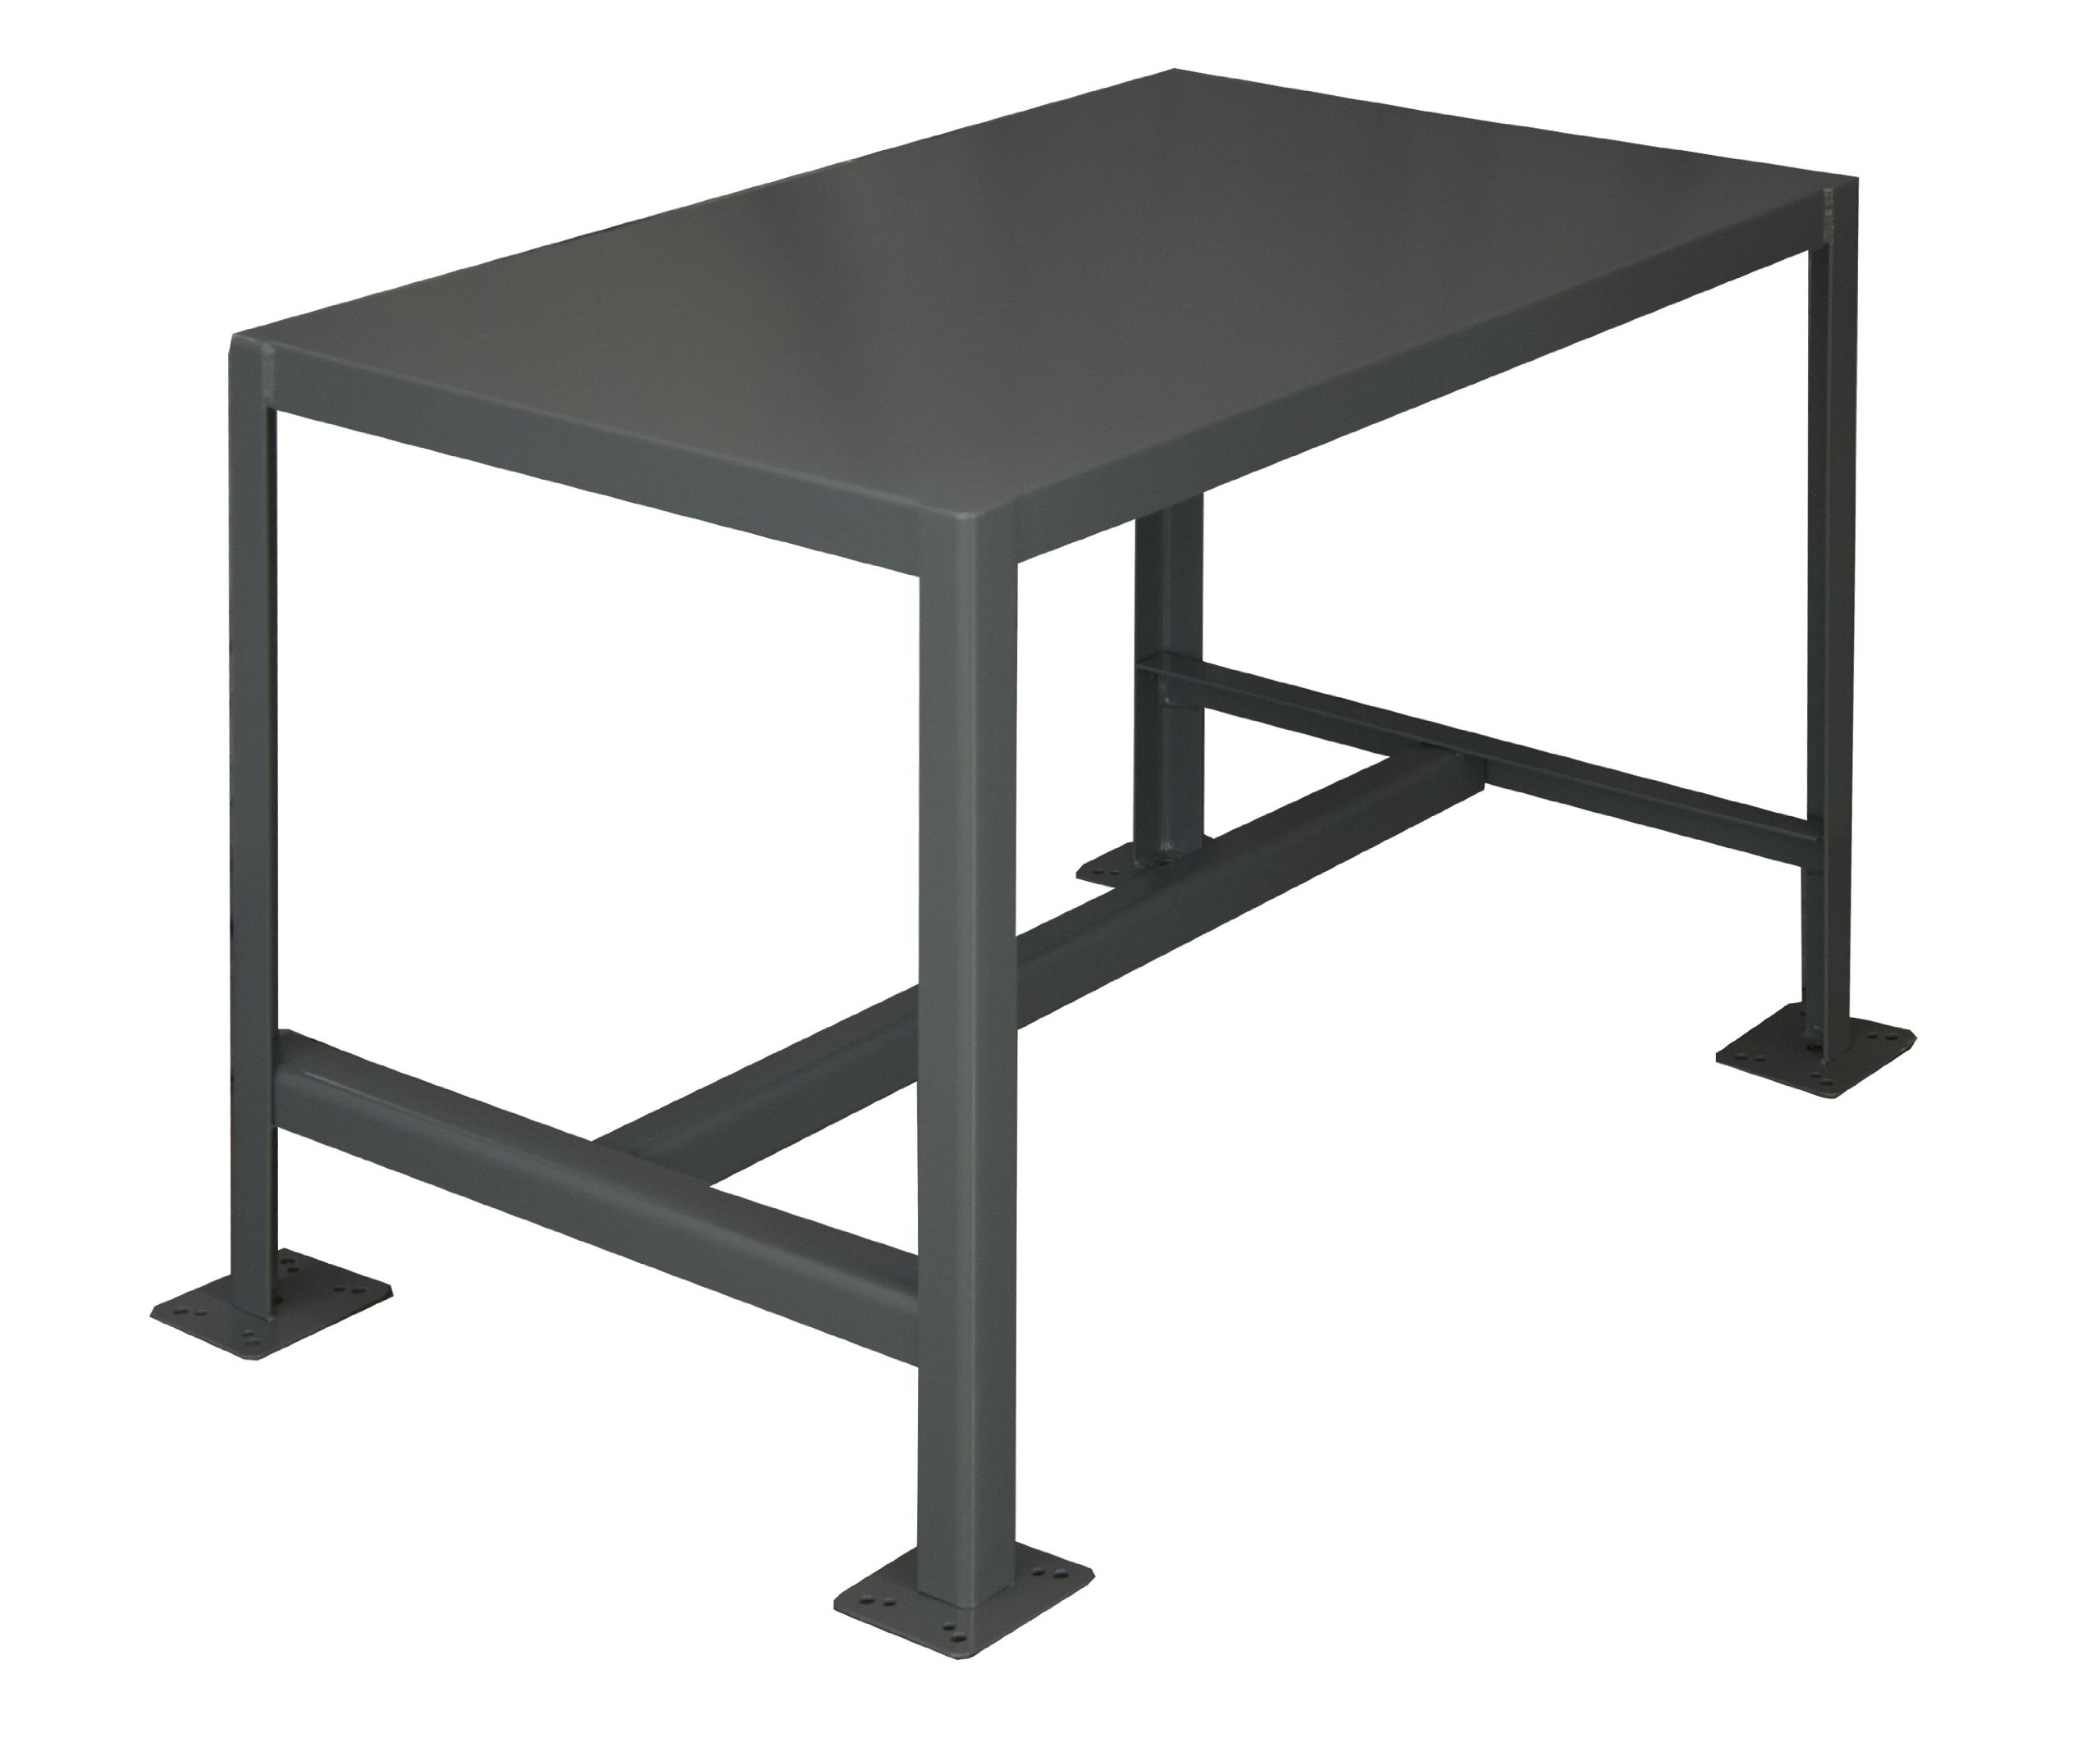 Durham Steel Medium Duty Machine Table, MT243630-2K195,  1 Shelves,  2000 lbs Capacity,  36'' Length x 24'' Width x 30'' Height by Durham